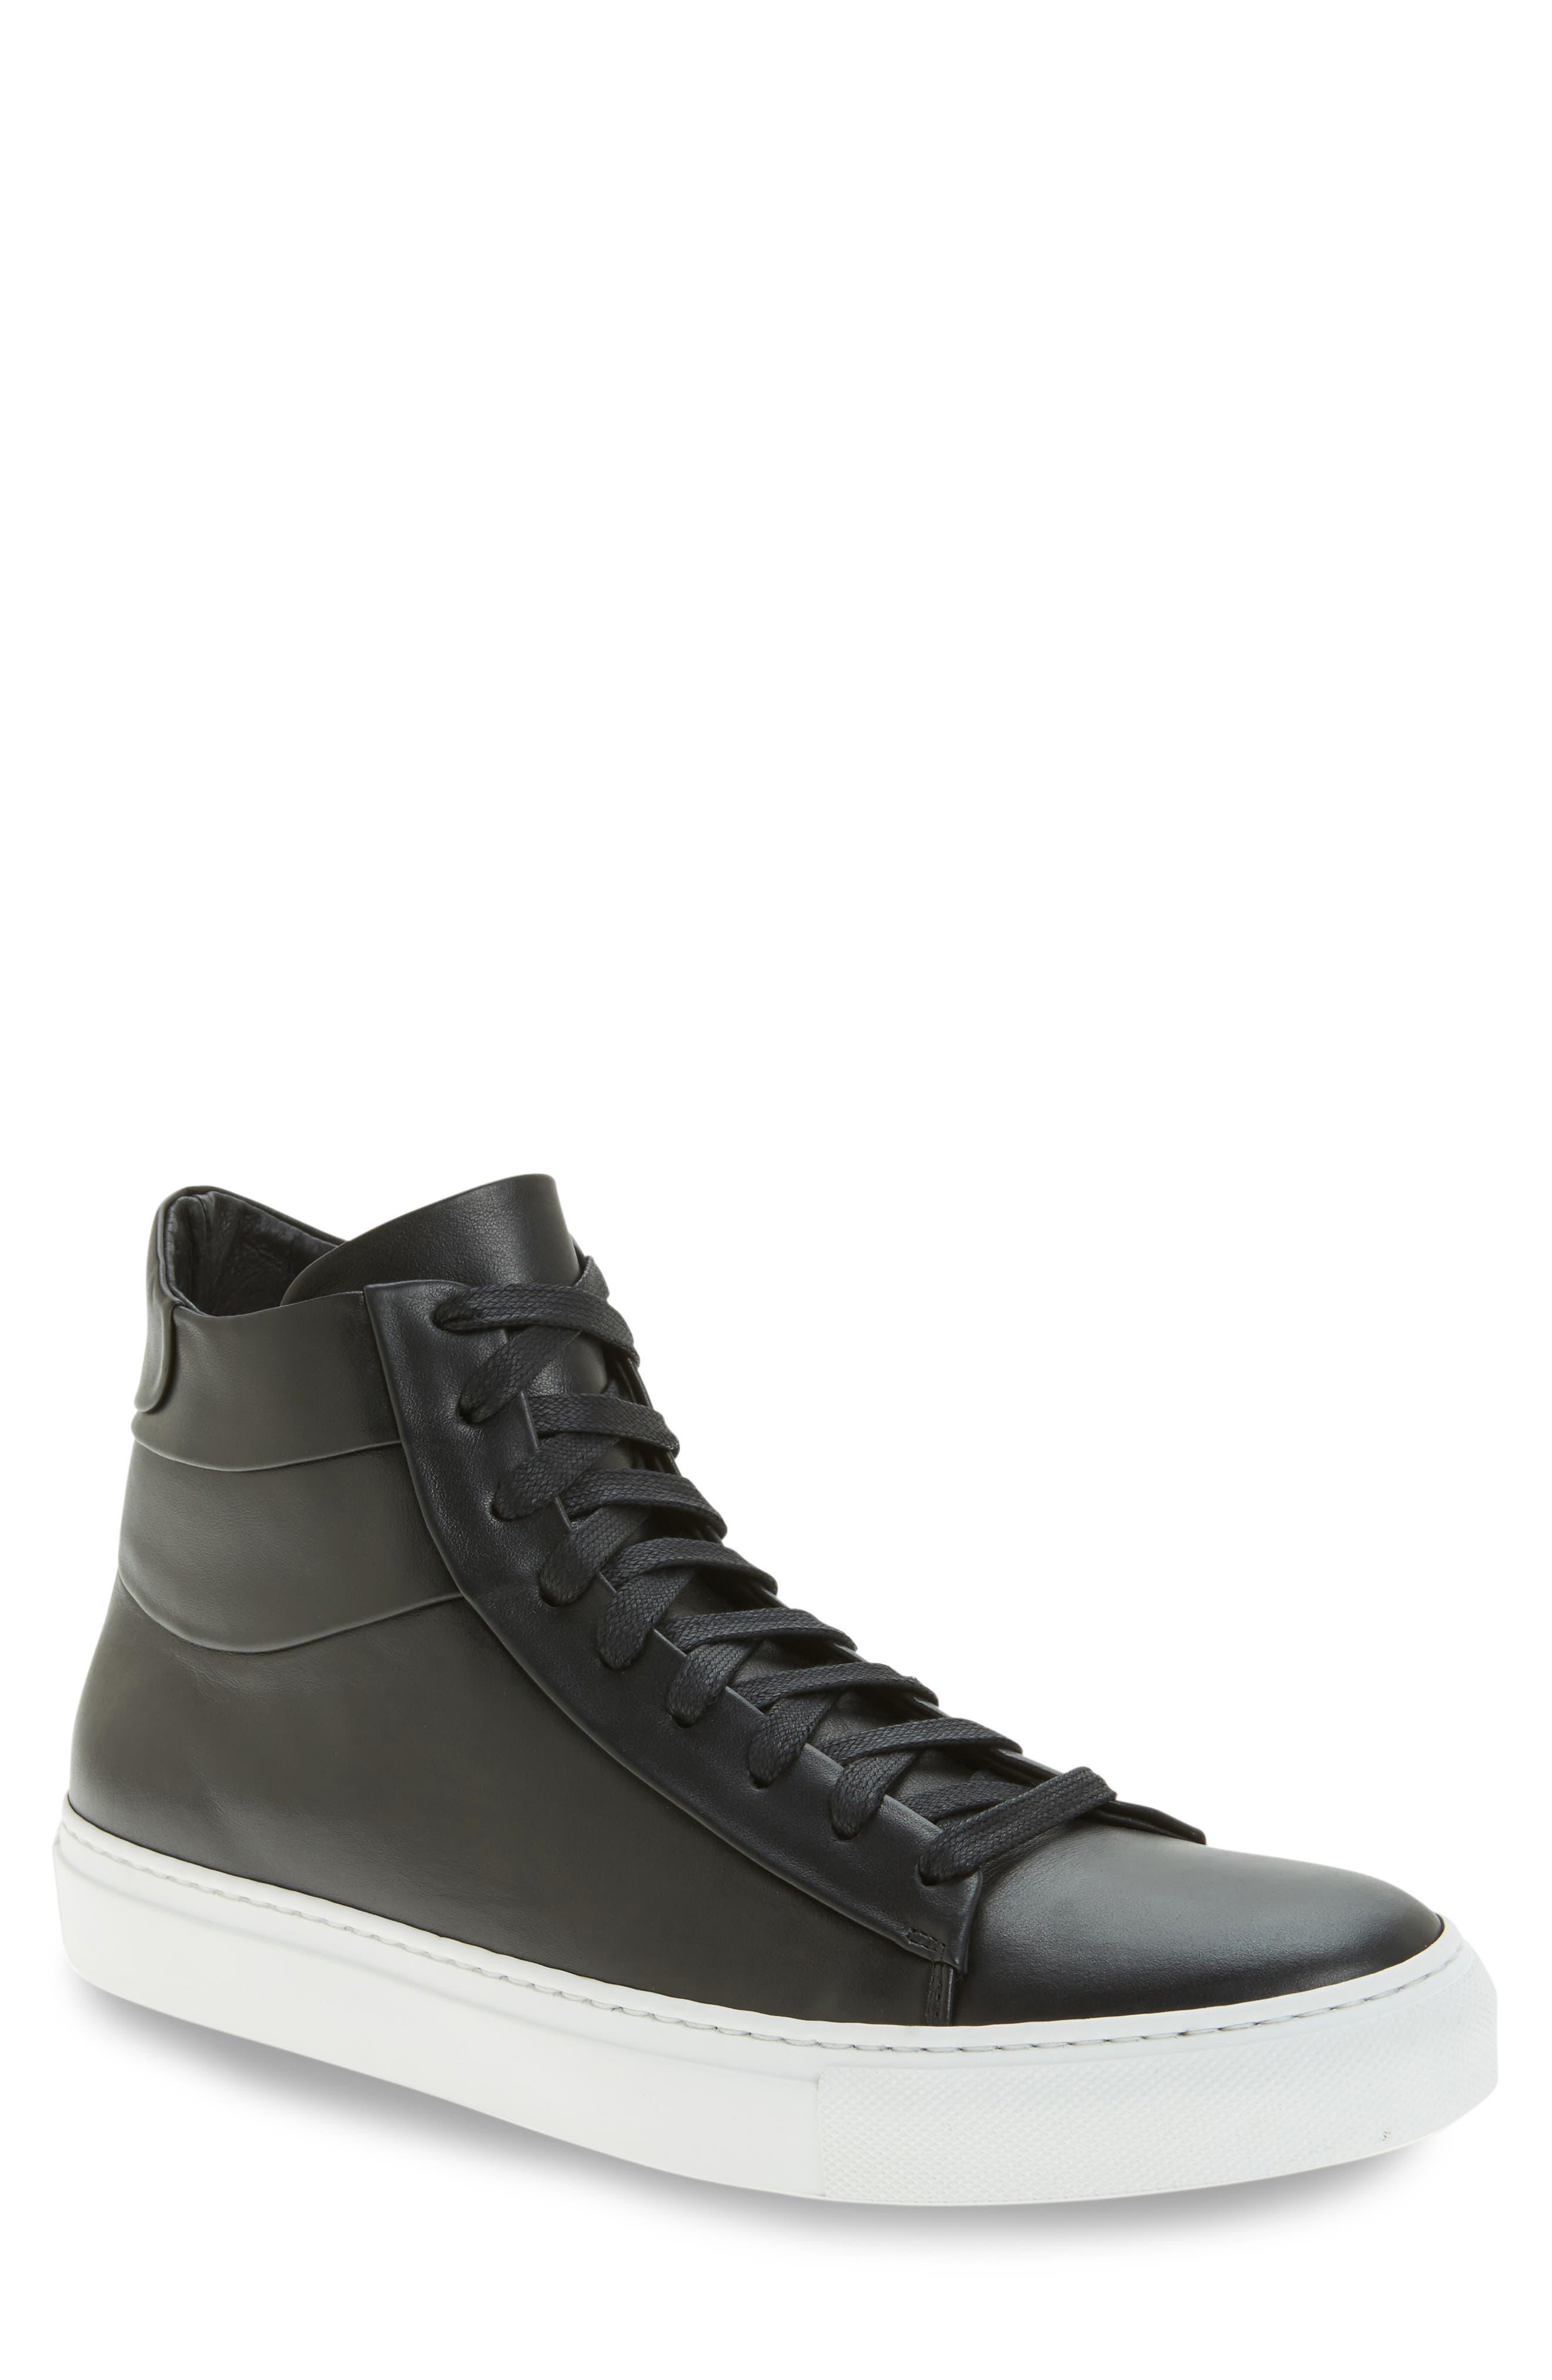 WINGS + HORNS Court Sneaker